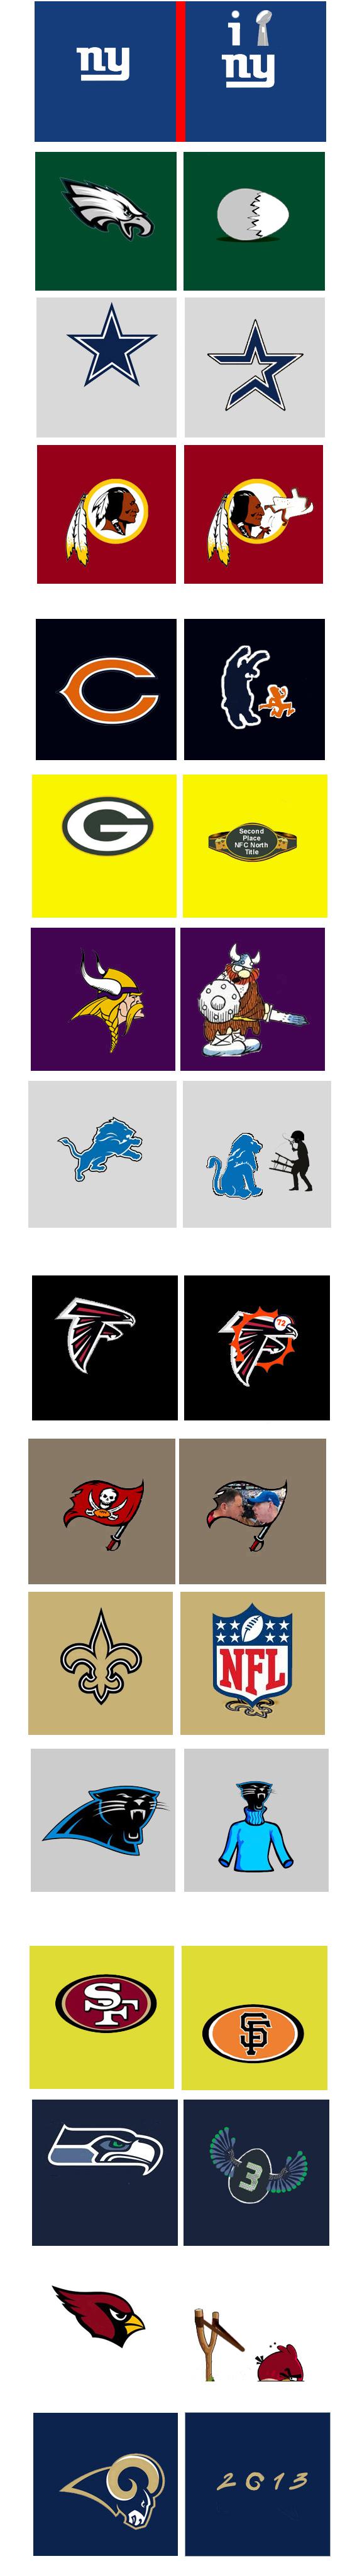 Kurt Snibbe NFC logo makeover